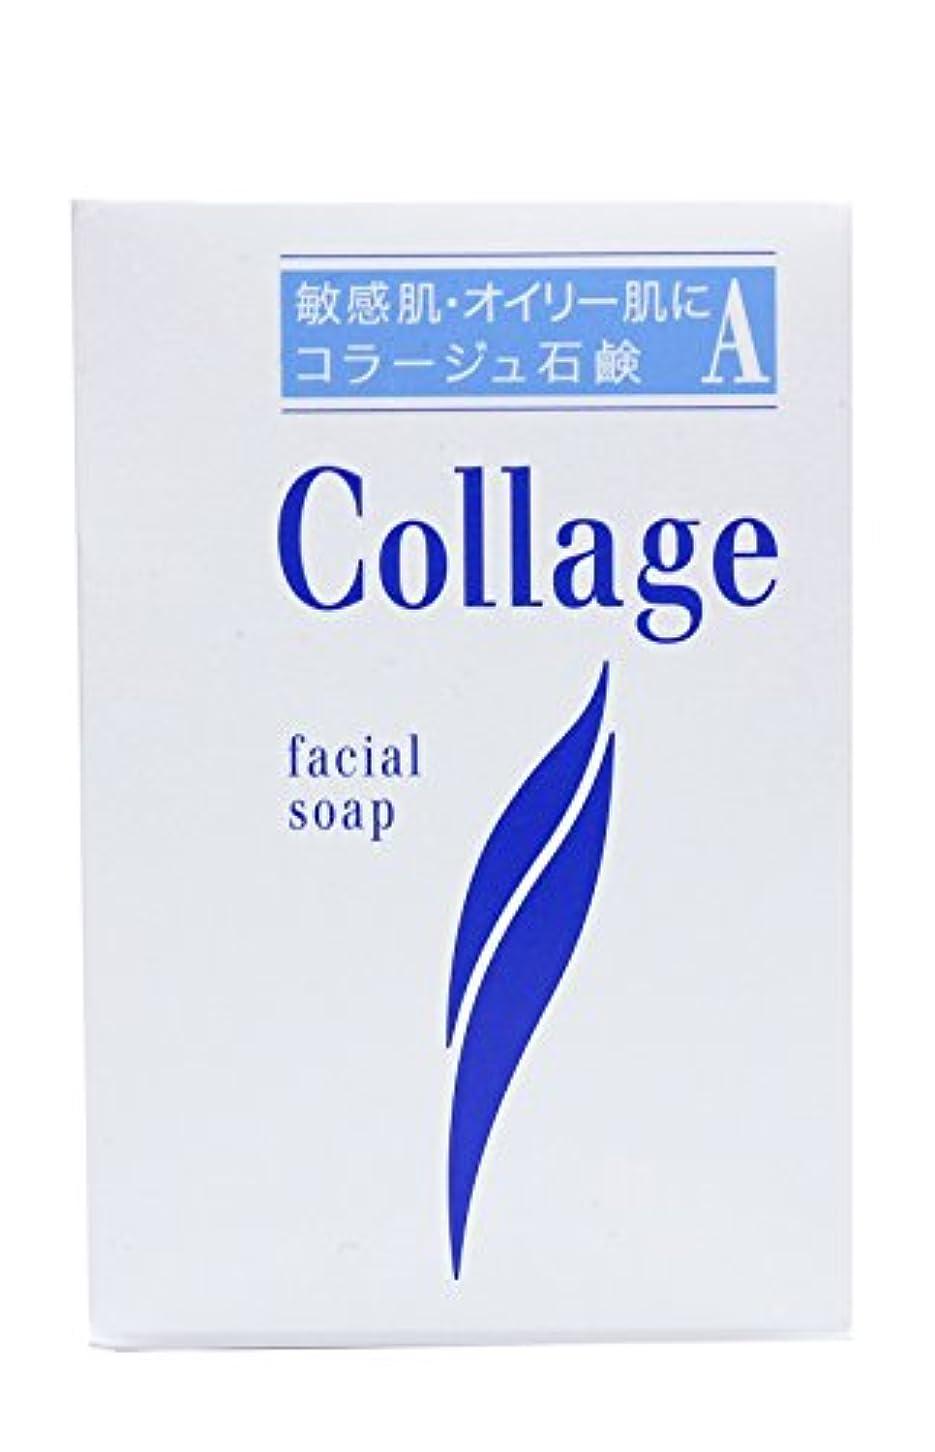 出版魔術師摂氏コラージュ A脂性肌用石鹸 100g